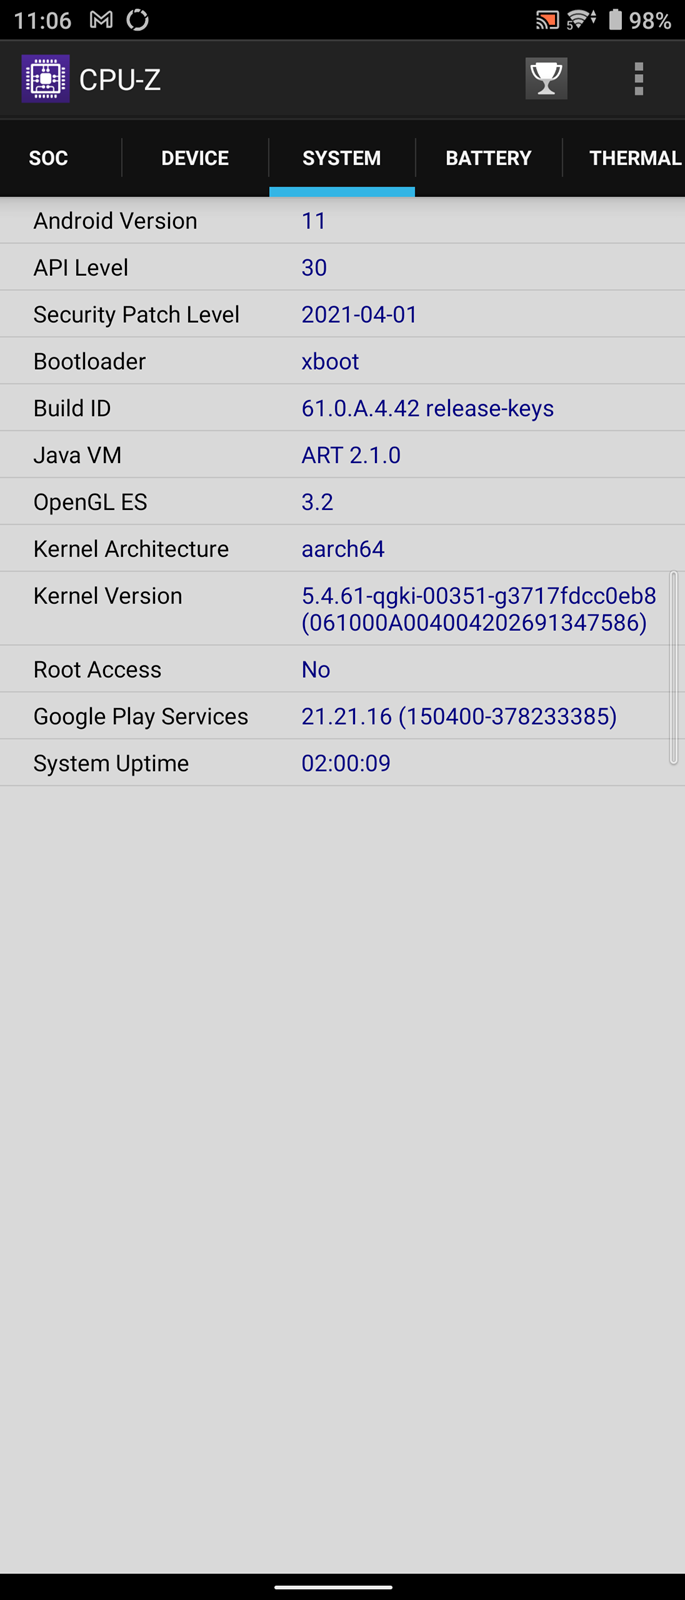 S888 處理器加上 4500 更大電池 30W 更快充電表現如何?Sony Xperia 1 III 性能測試 / 電力續航 / 遊戲實測 / 充電實測 @3C 達人廖阿輝